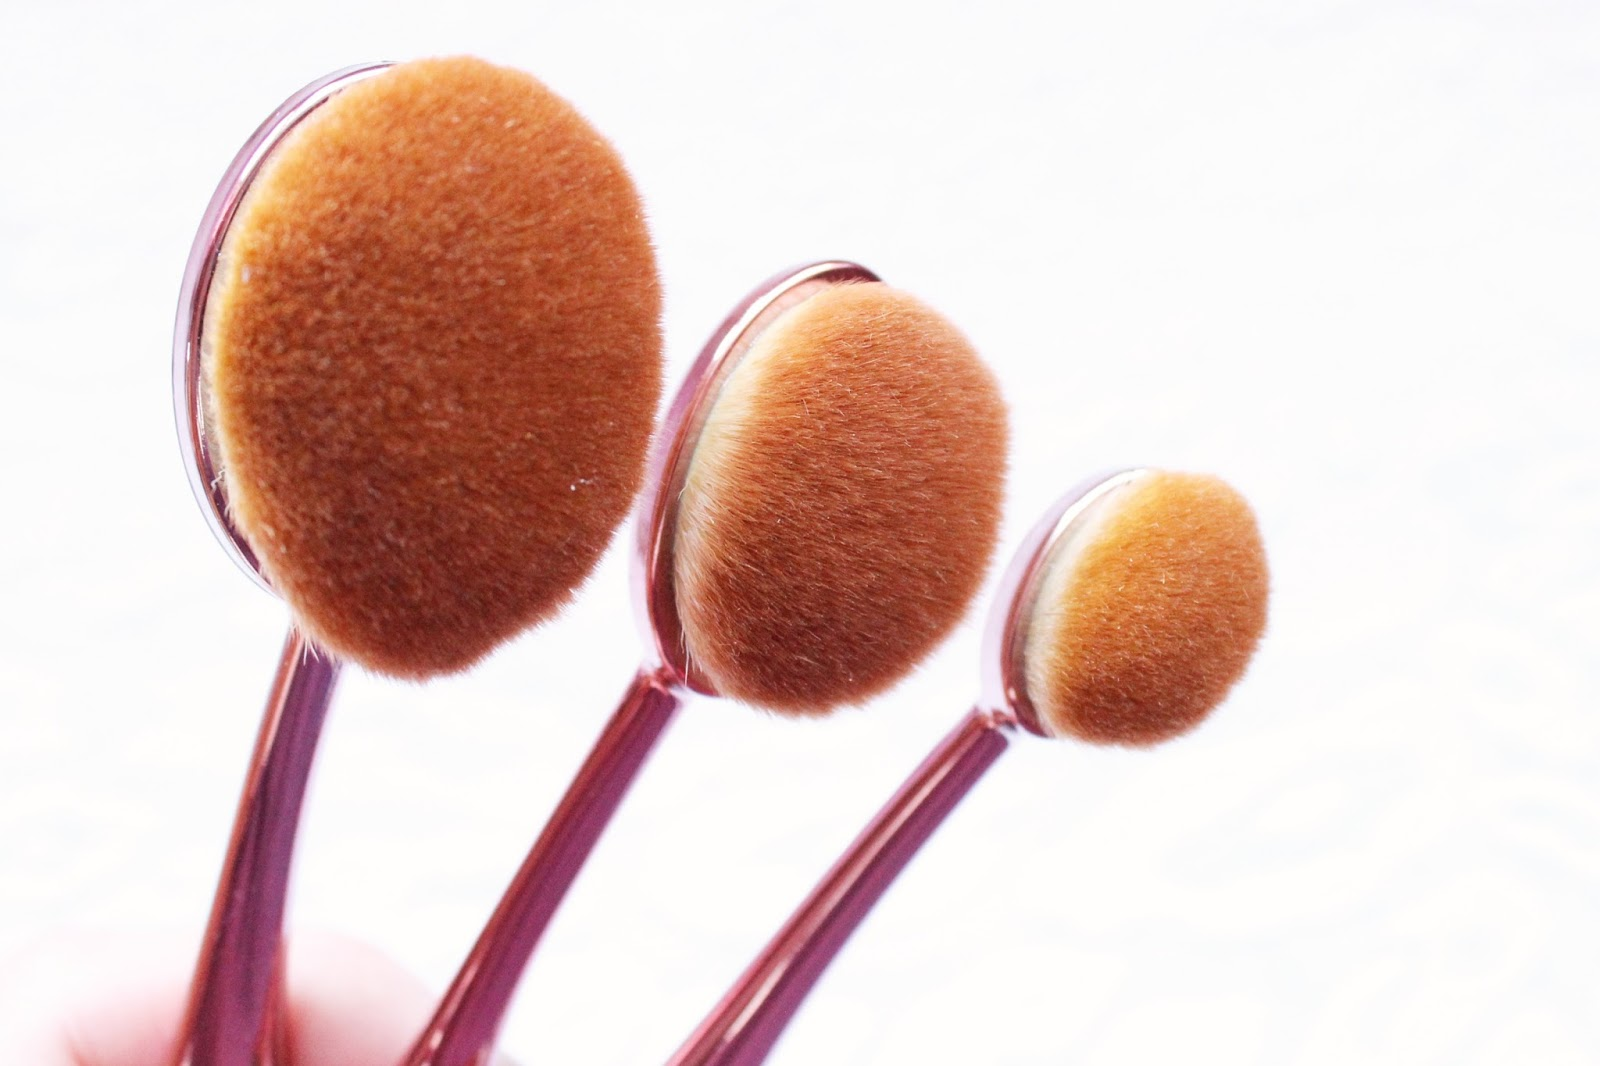 Crown Brush Rose Gold Full Face Contour Set